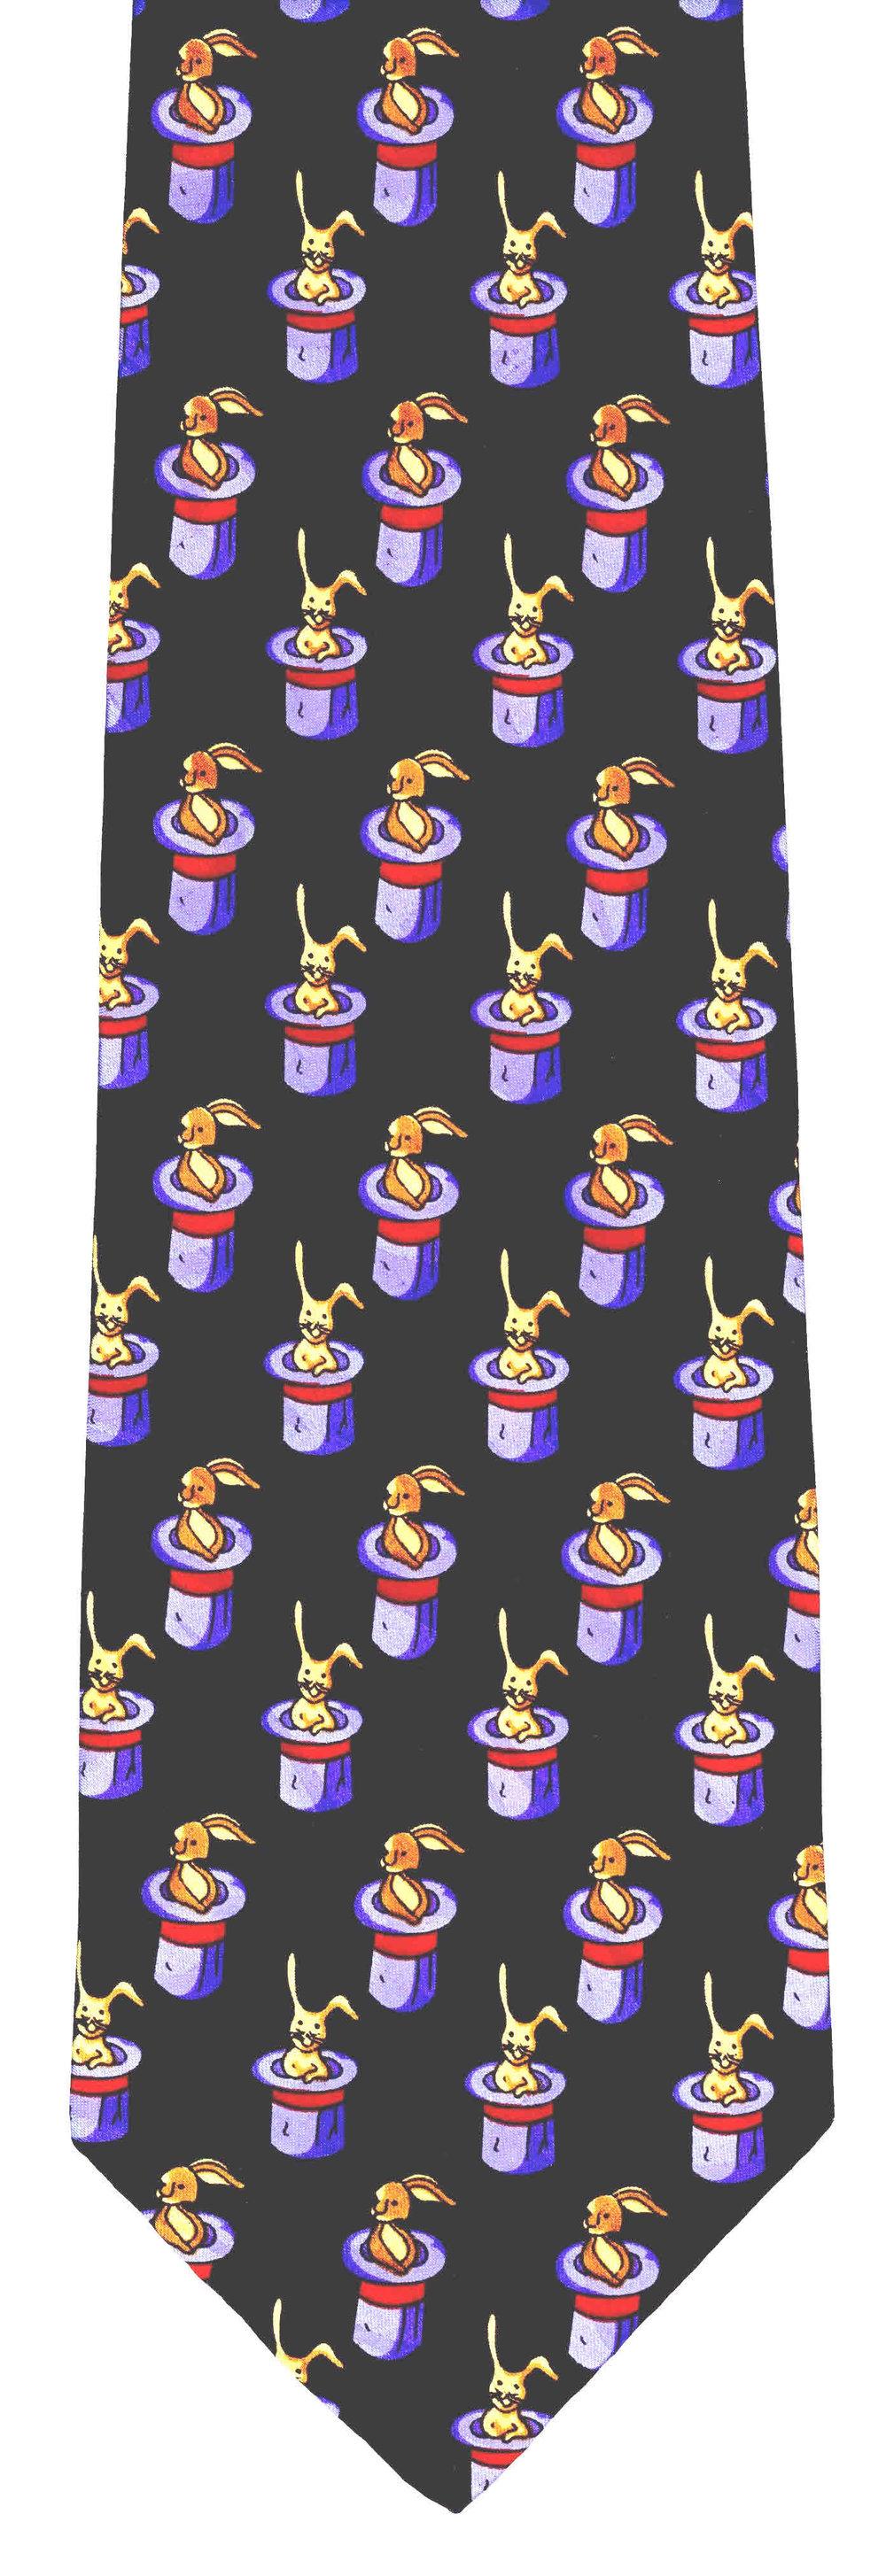 060 Rabbit Hats.jpg